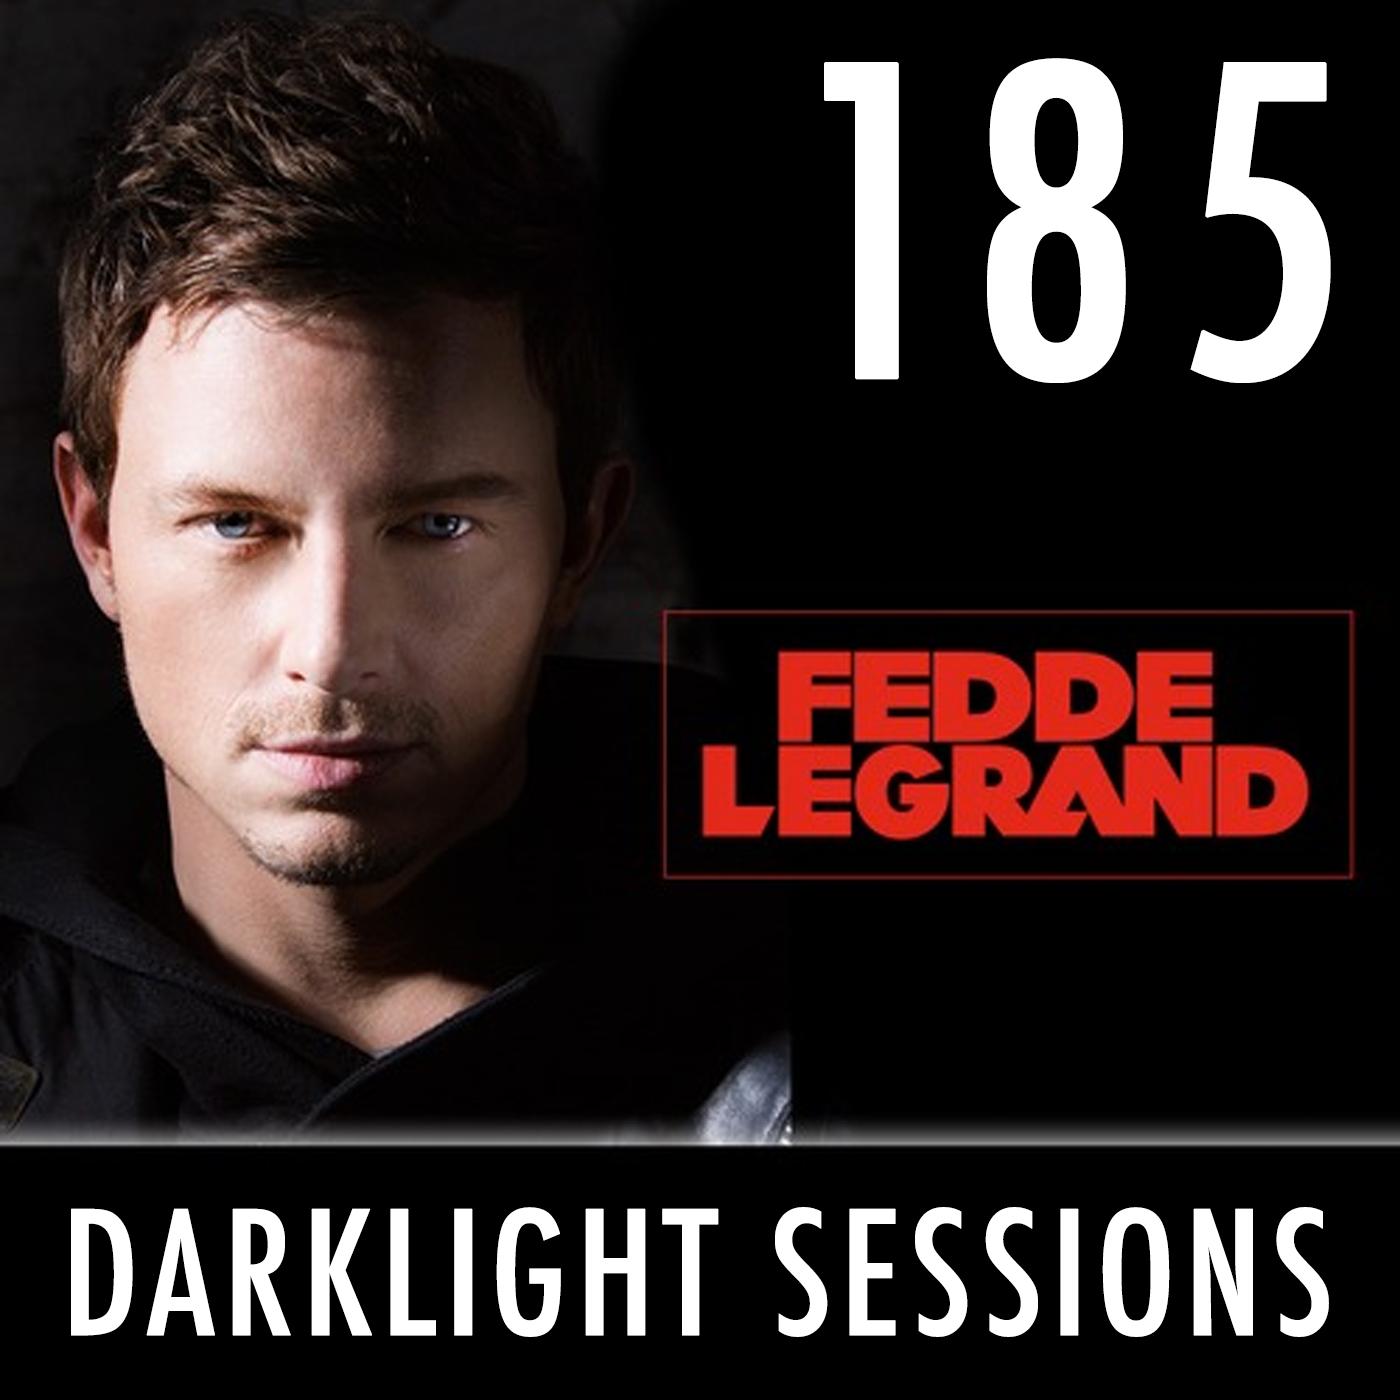 Darklight Sessions 185